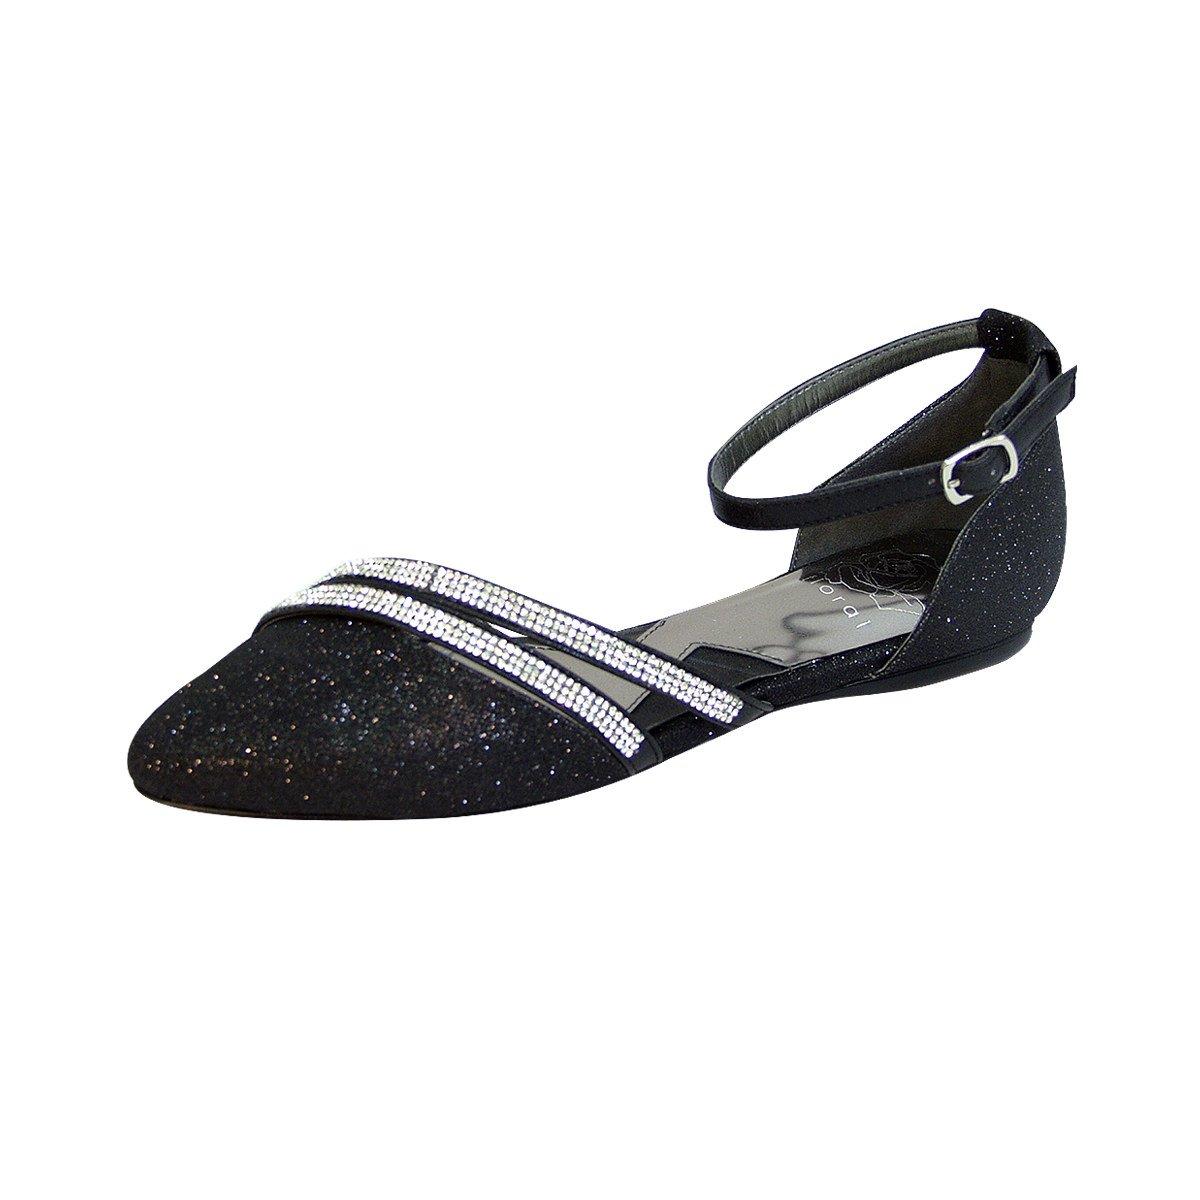 Fuzzy Hallie Women Wide Width Open Shank Pointed Toe Buckle Ankle Strap Flats (Size & Measurement) B0773WF7XL 8 D|Black